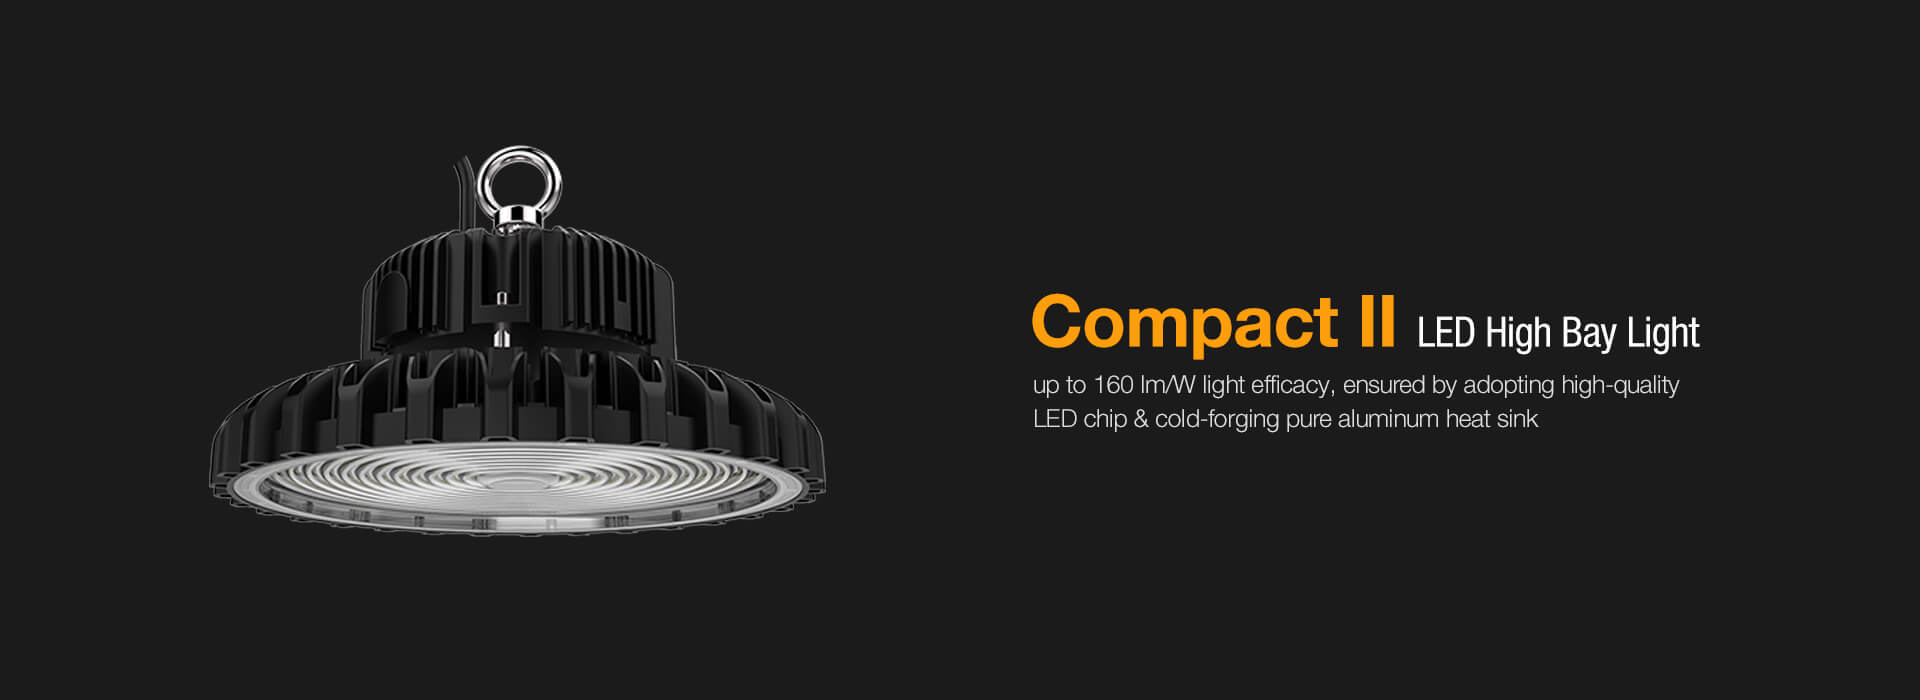 Compact II LED High Bay Light - YAHAM Lighting